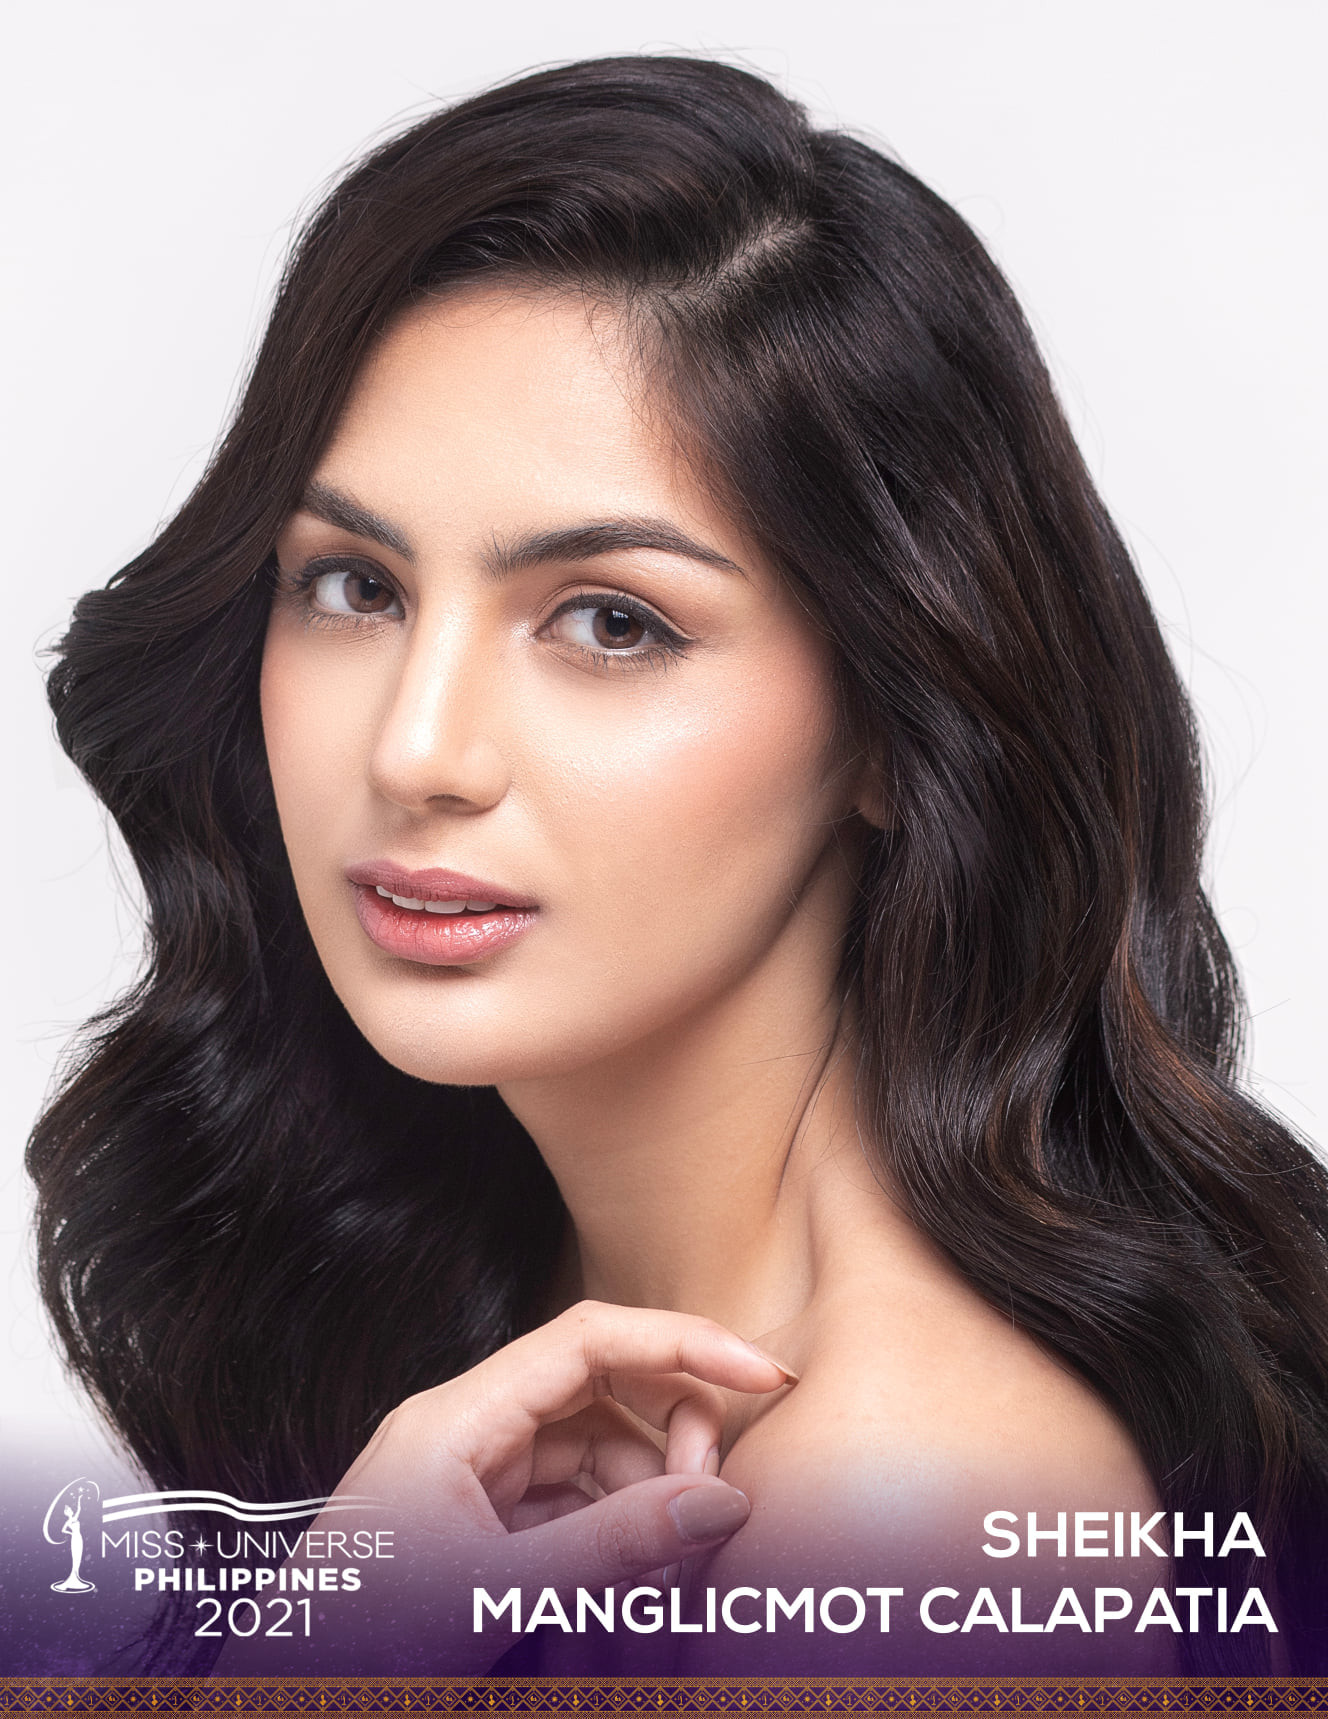 pre-candidatas a miss universe philippines 2021. - Página 2 AlKIlS